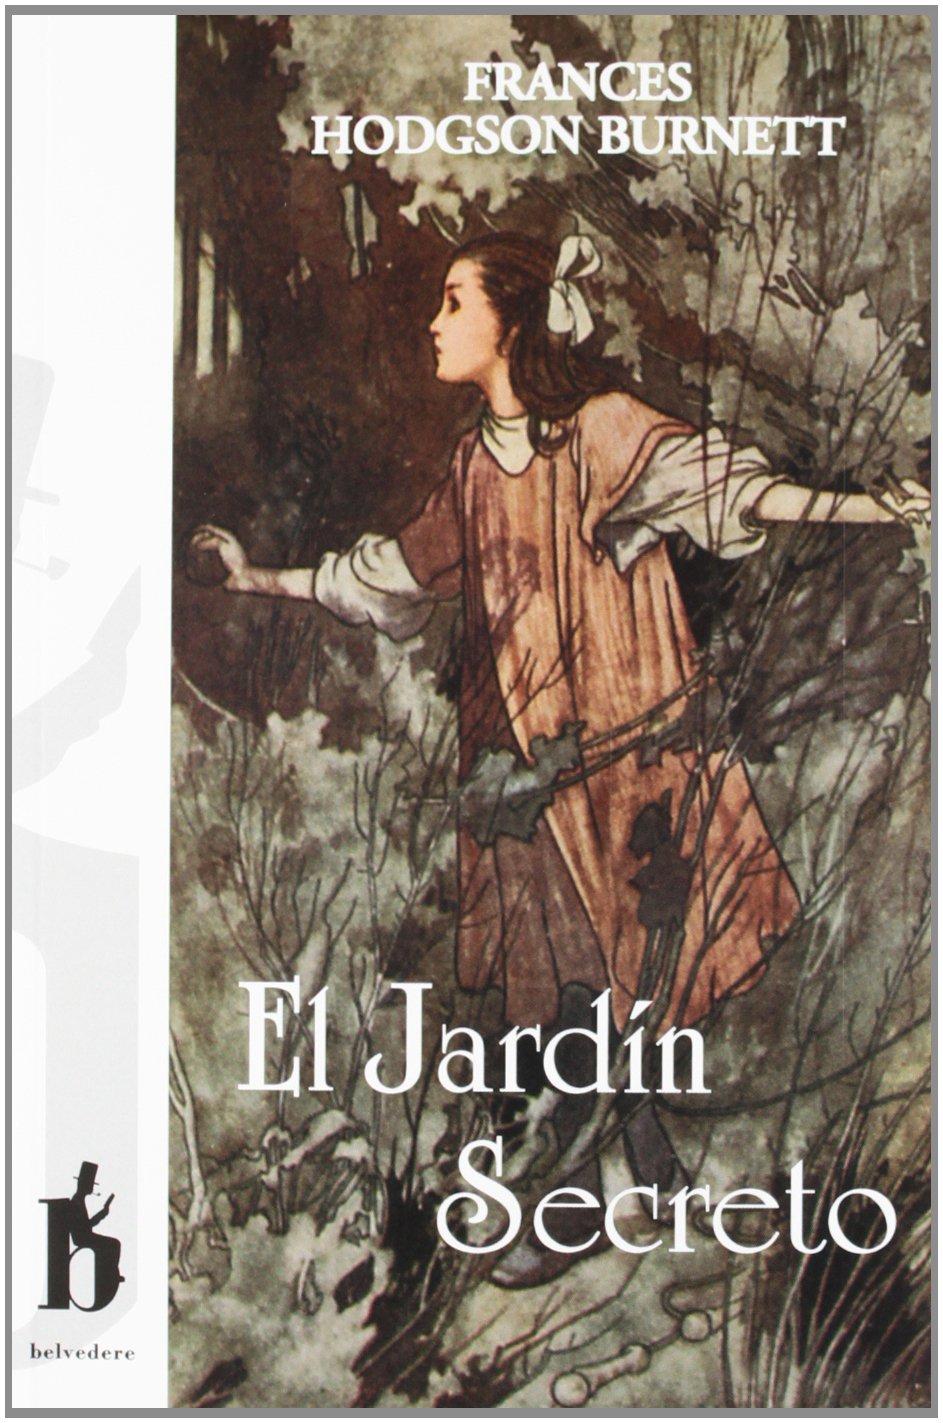 JARDIN SECRETO,EL (NARRATIVA): Amazon.es: FRANCESS HODGSON BURNETT, CHARLES ROBINSON, RICARDO BESTUÉ: Libros